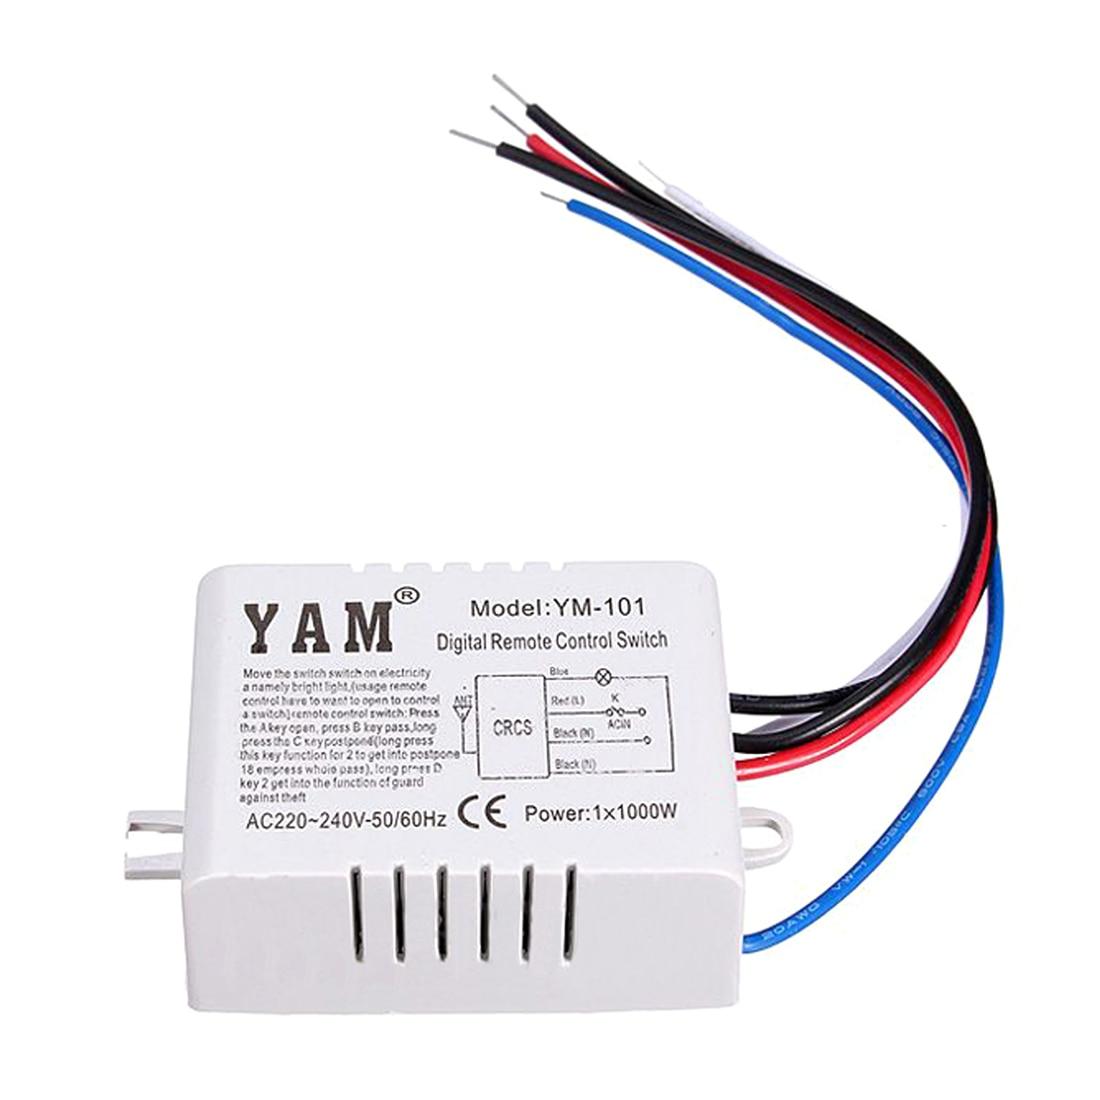 yam ac 220v wireless light lamp digital switch with remote control [ 1100 x 1100 Pixel ]